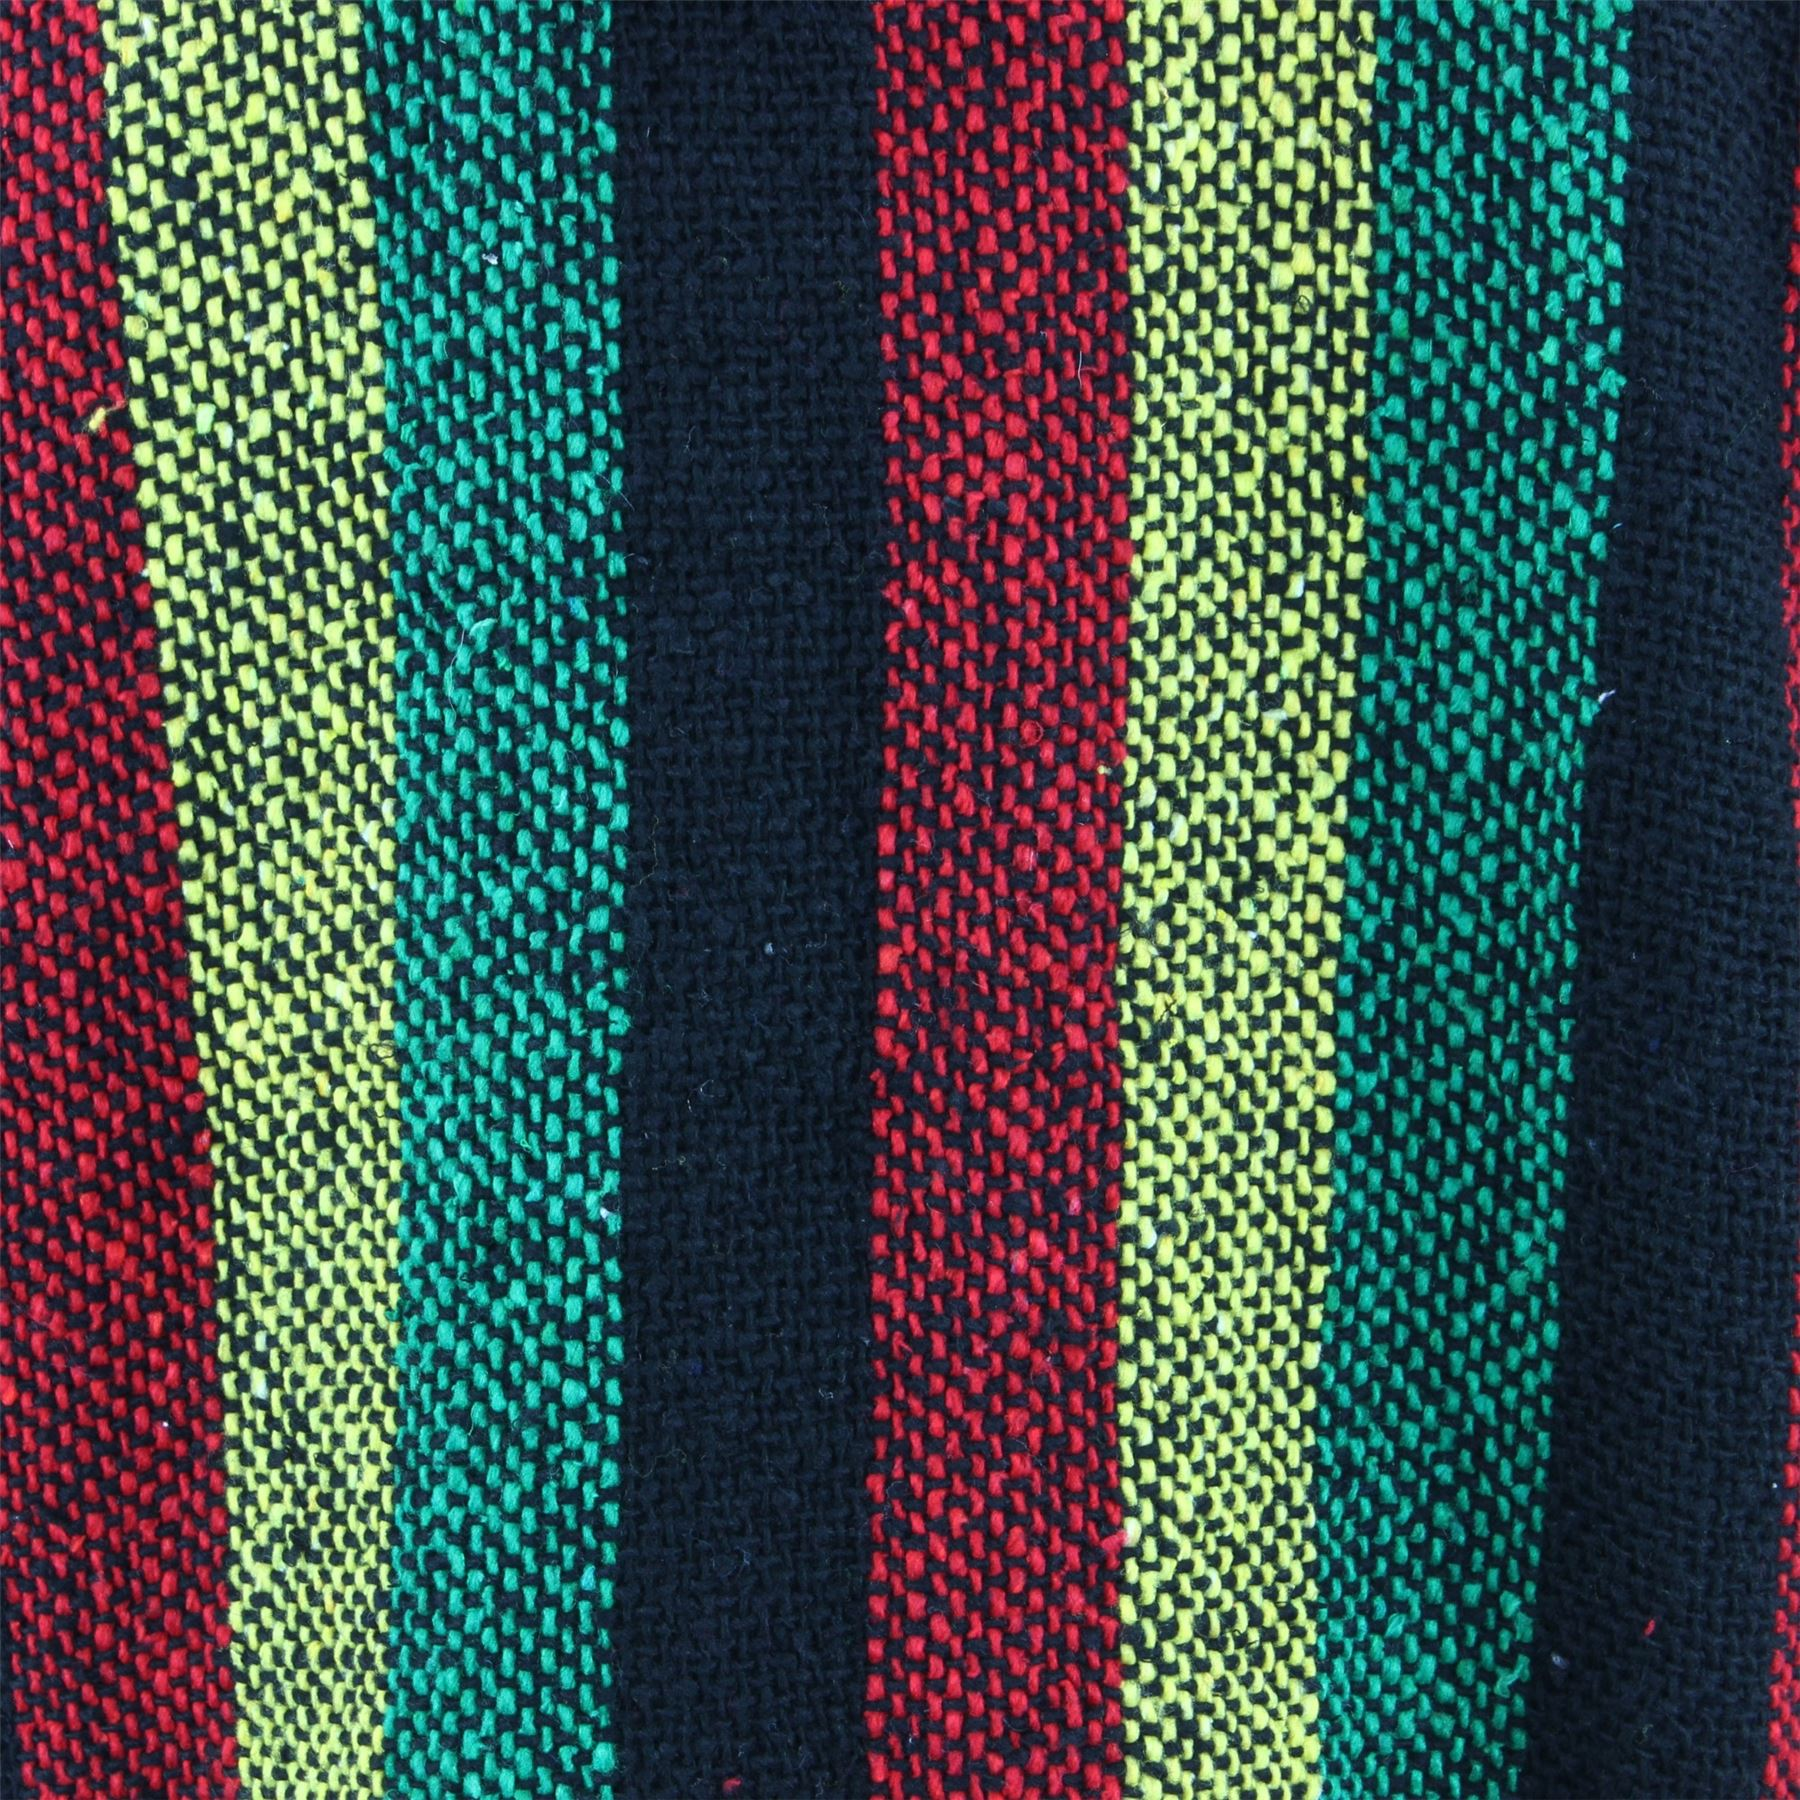 Mexican-Baja-Hoodie-Hoody-Jerga-Rug-Jumper-Siesta-Surf-Hippy-Baha-Pullover thumbnail 7